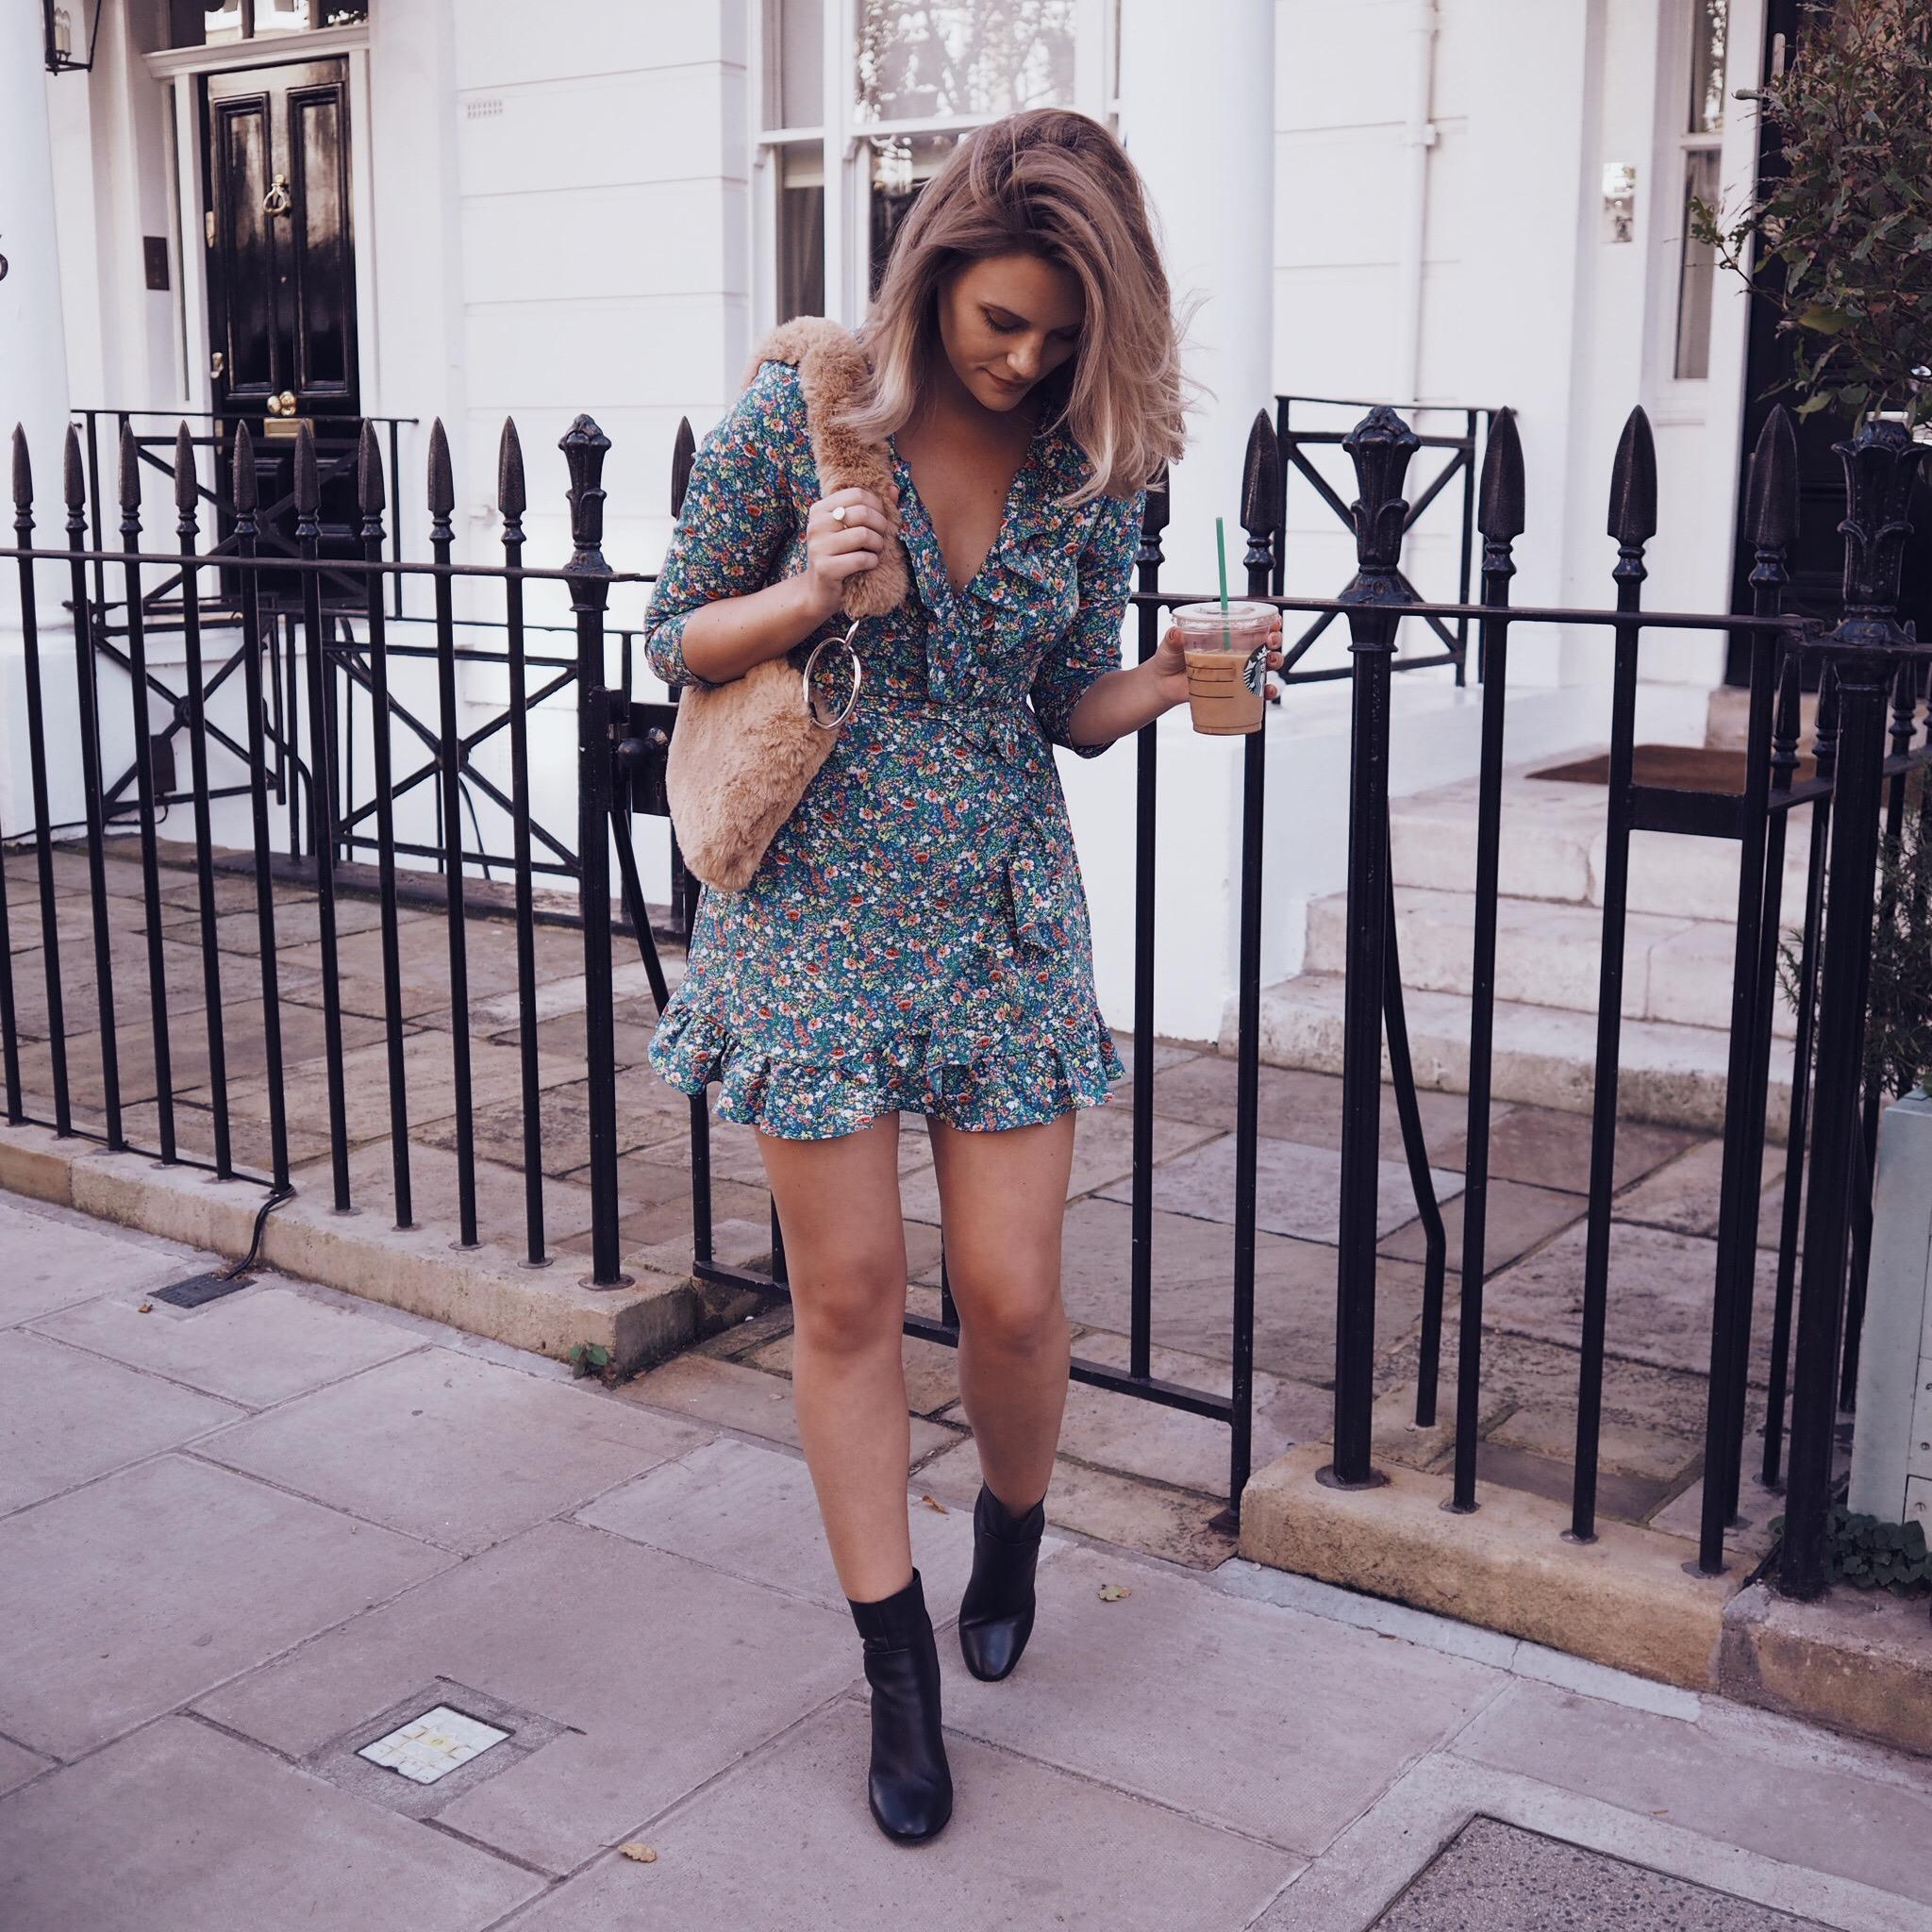 cocoa chelsea jesschamilton instagram tiptop autumn starbucks dress